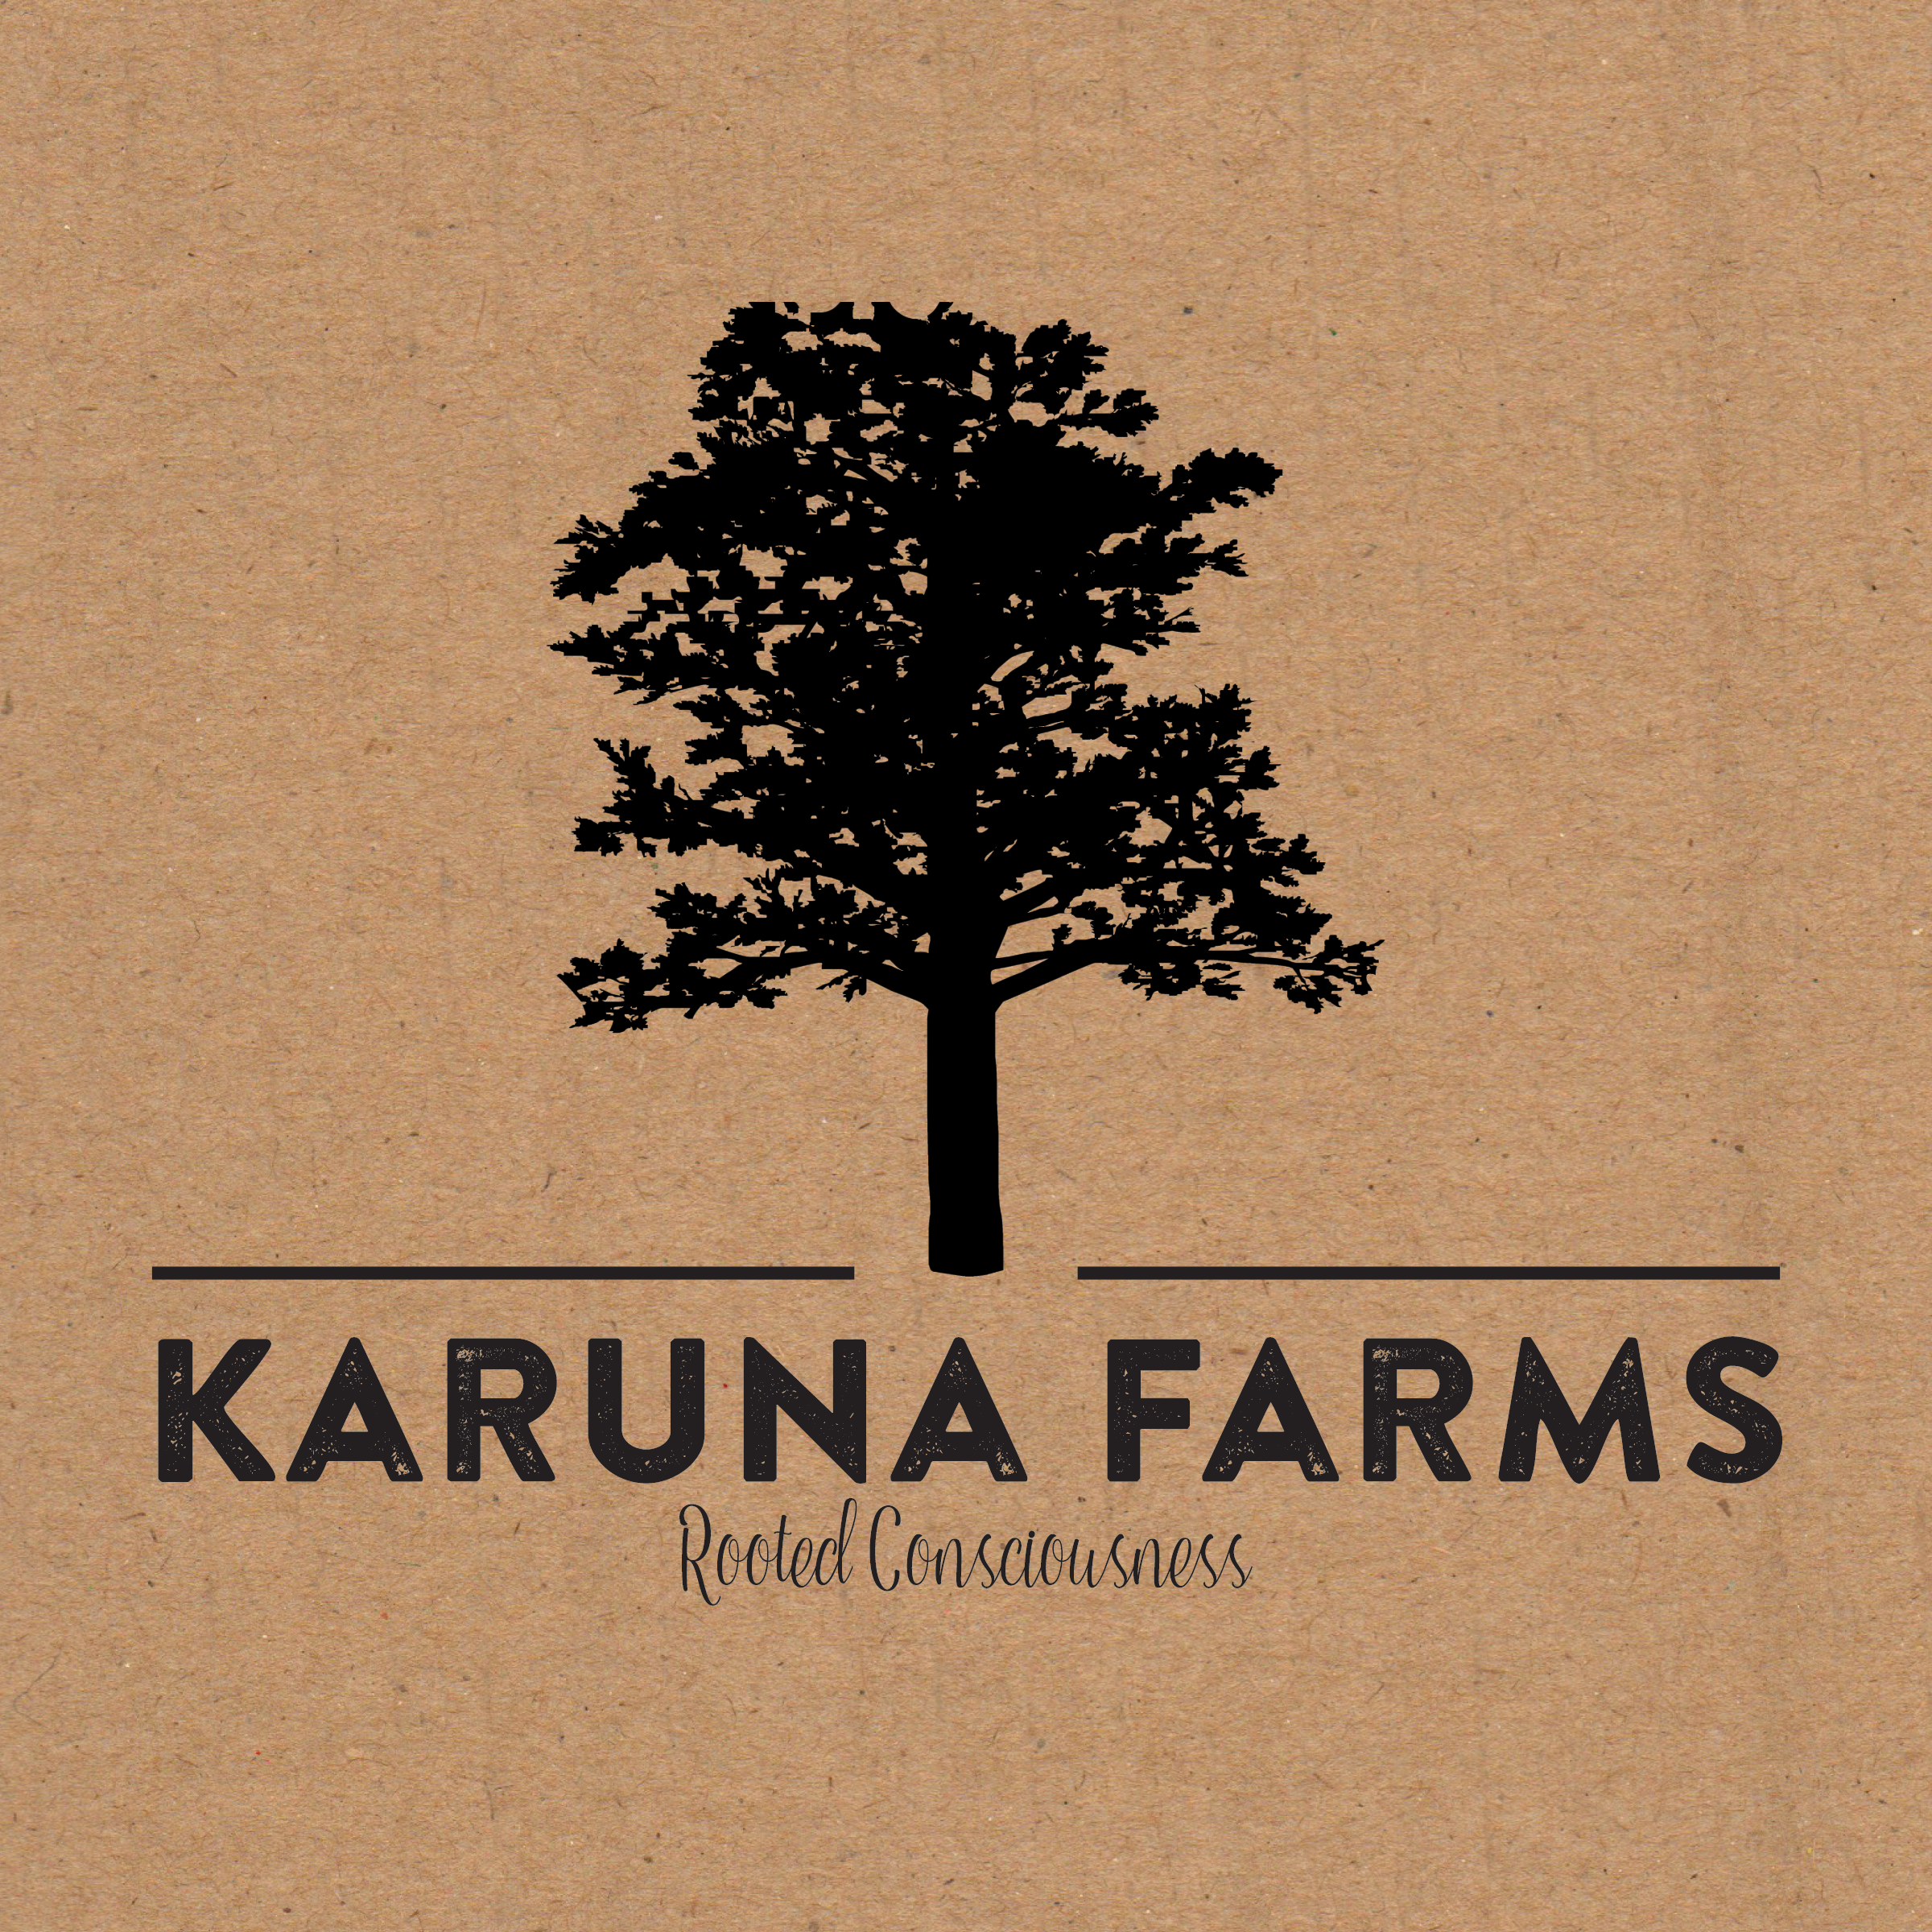 Karuna-Farms-Logo-2-2.png